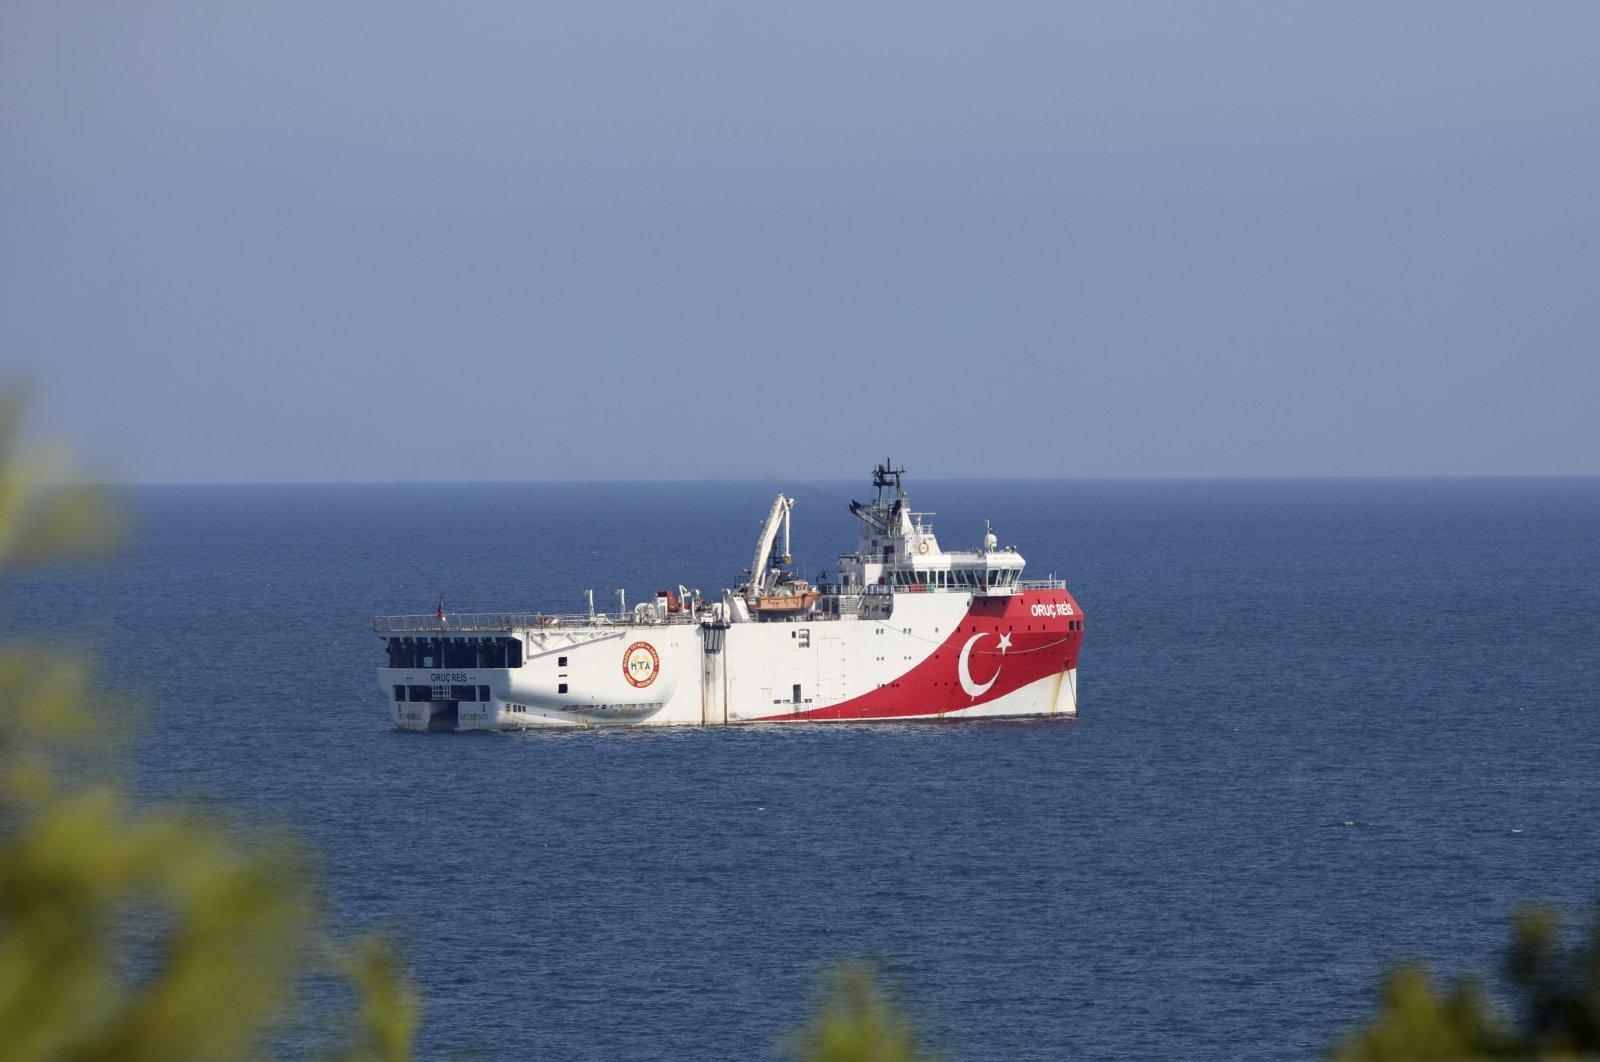 Turkey's research vessel Oruç Reis anchors off the coast of Antalya on the Mediterranean, Turkey, Sept. 13, 2020. (AP Photo)